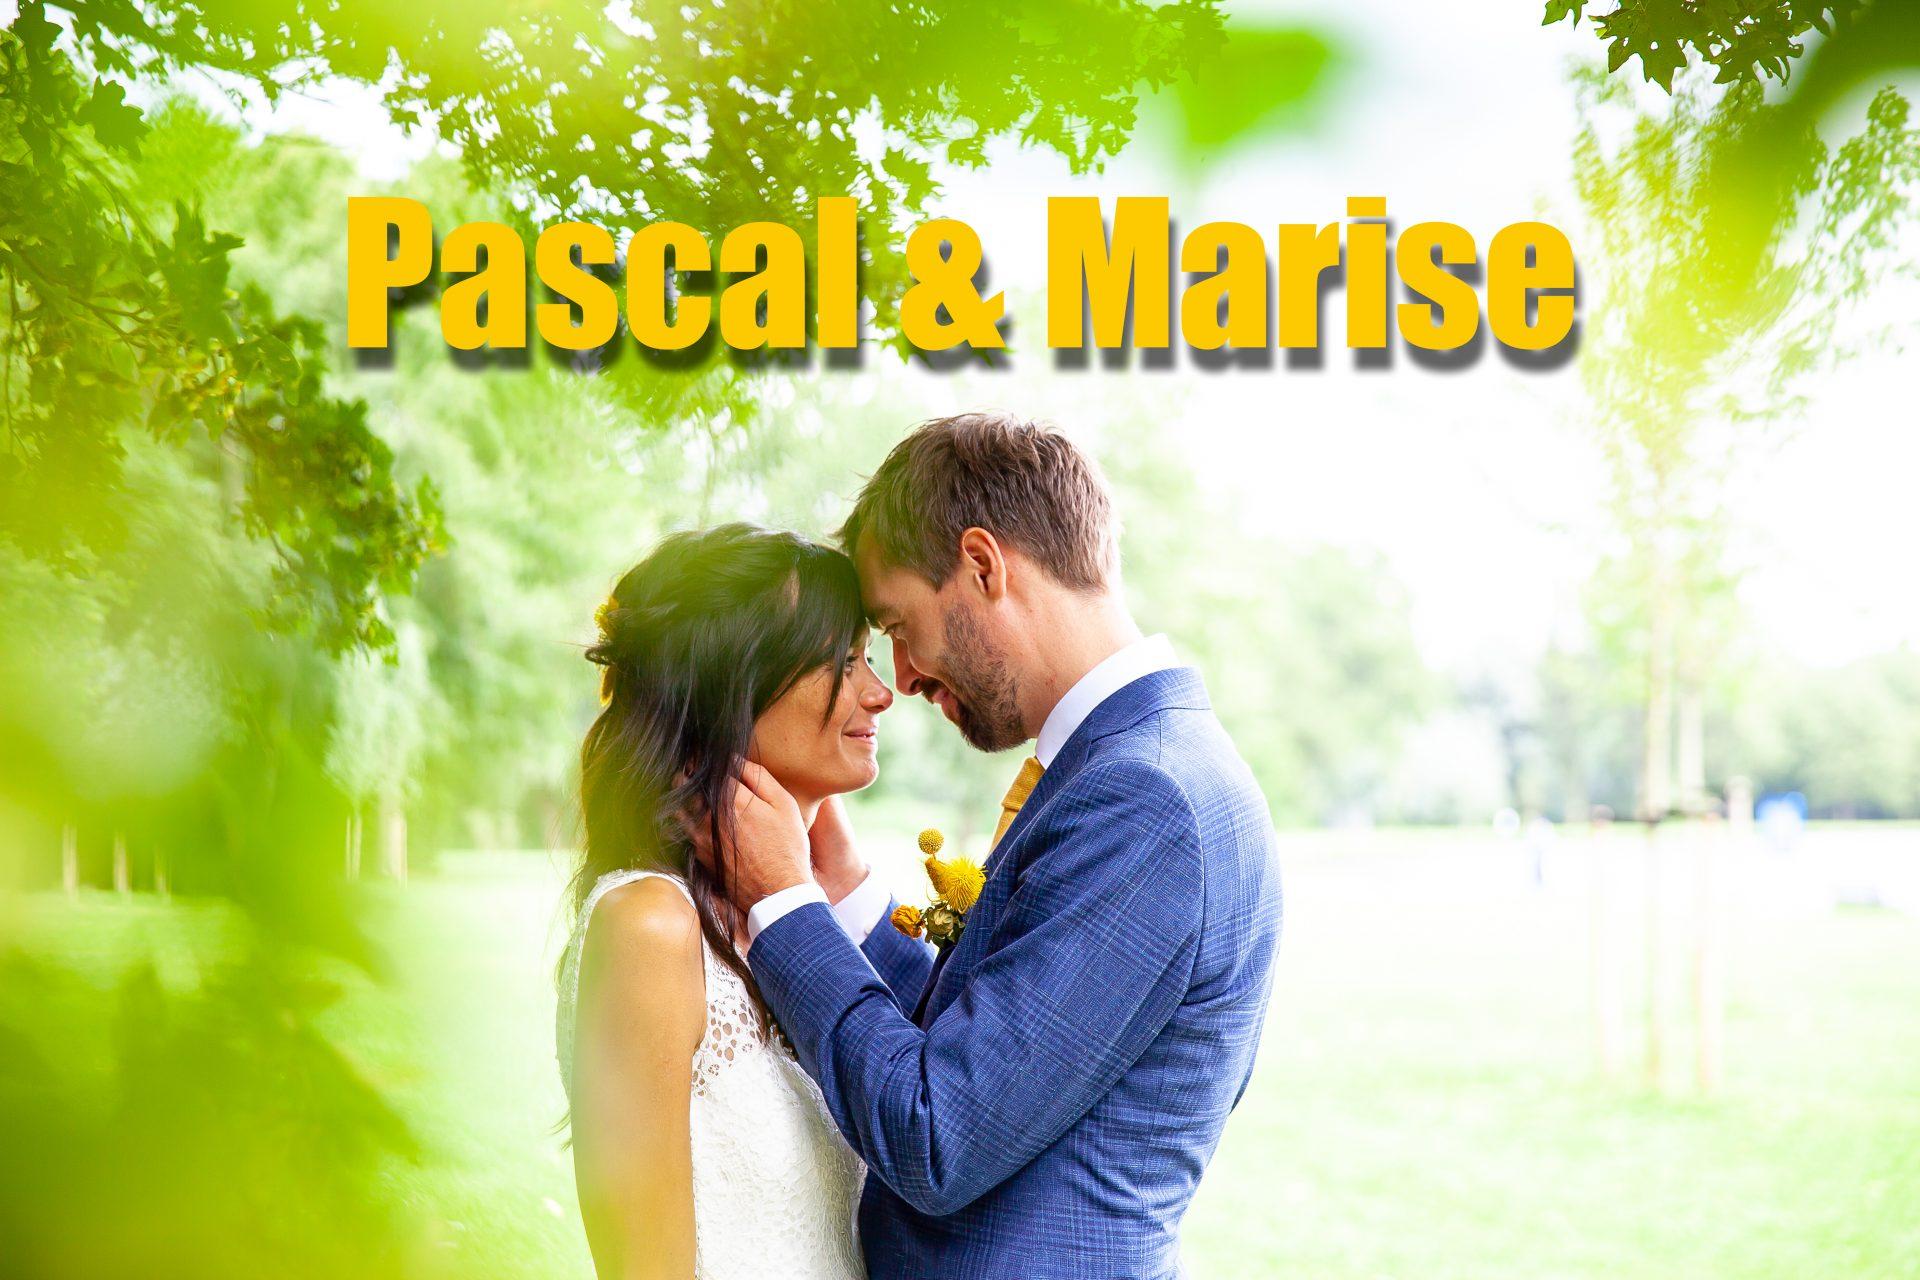 Pascal & Marise